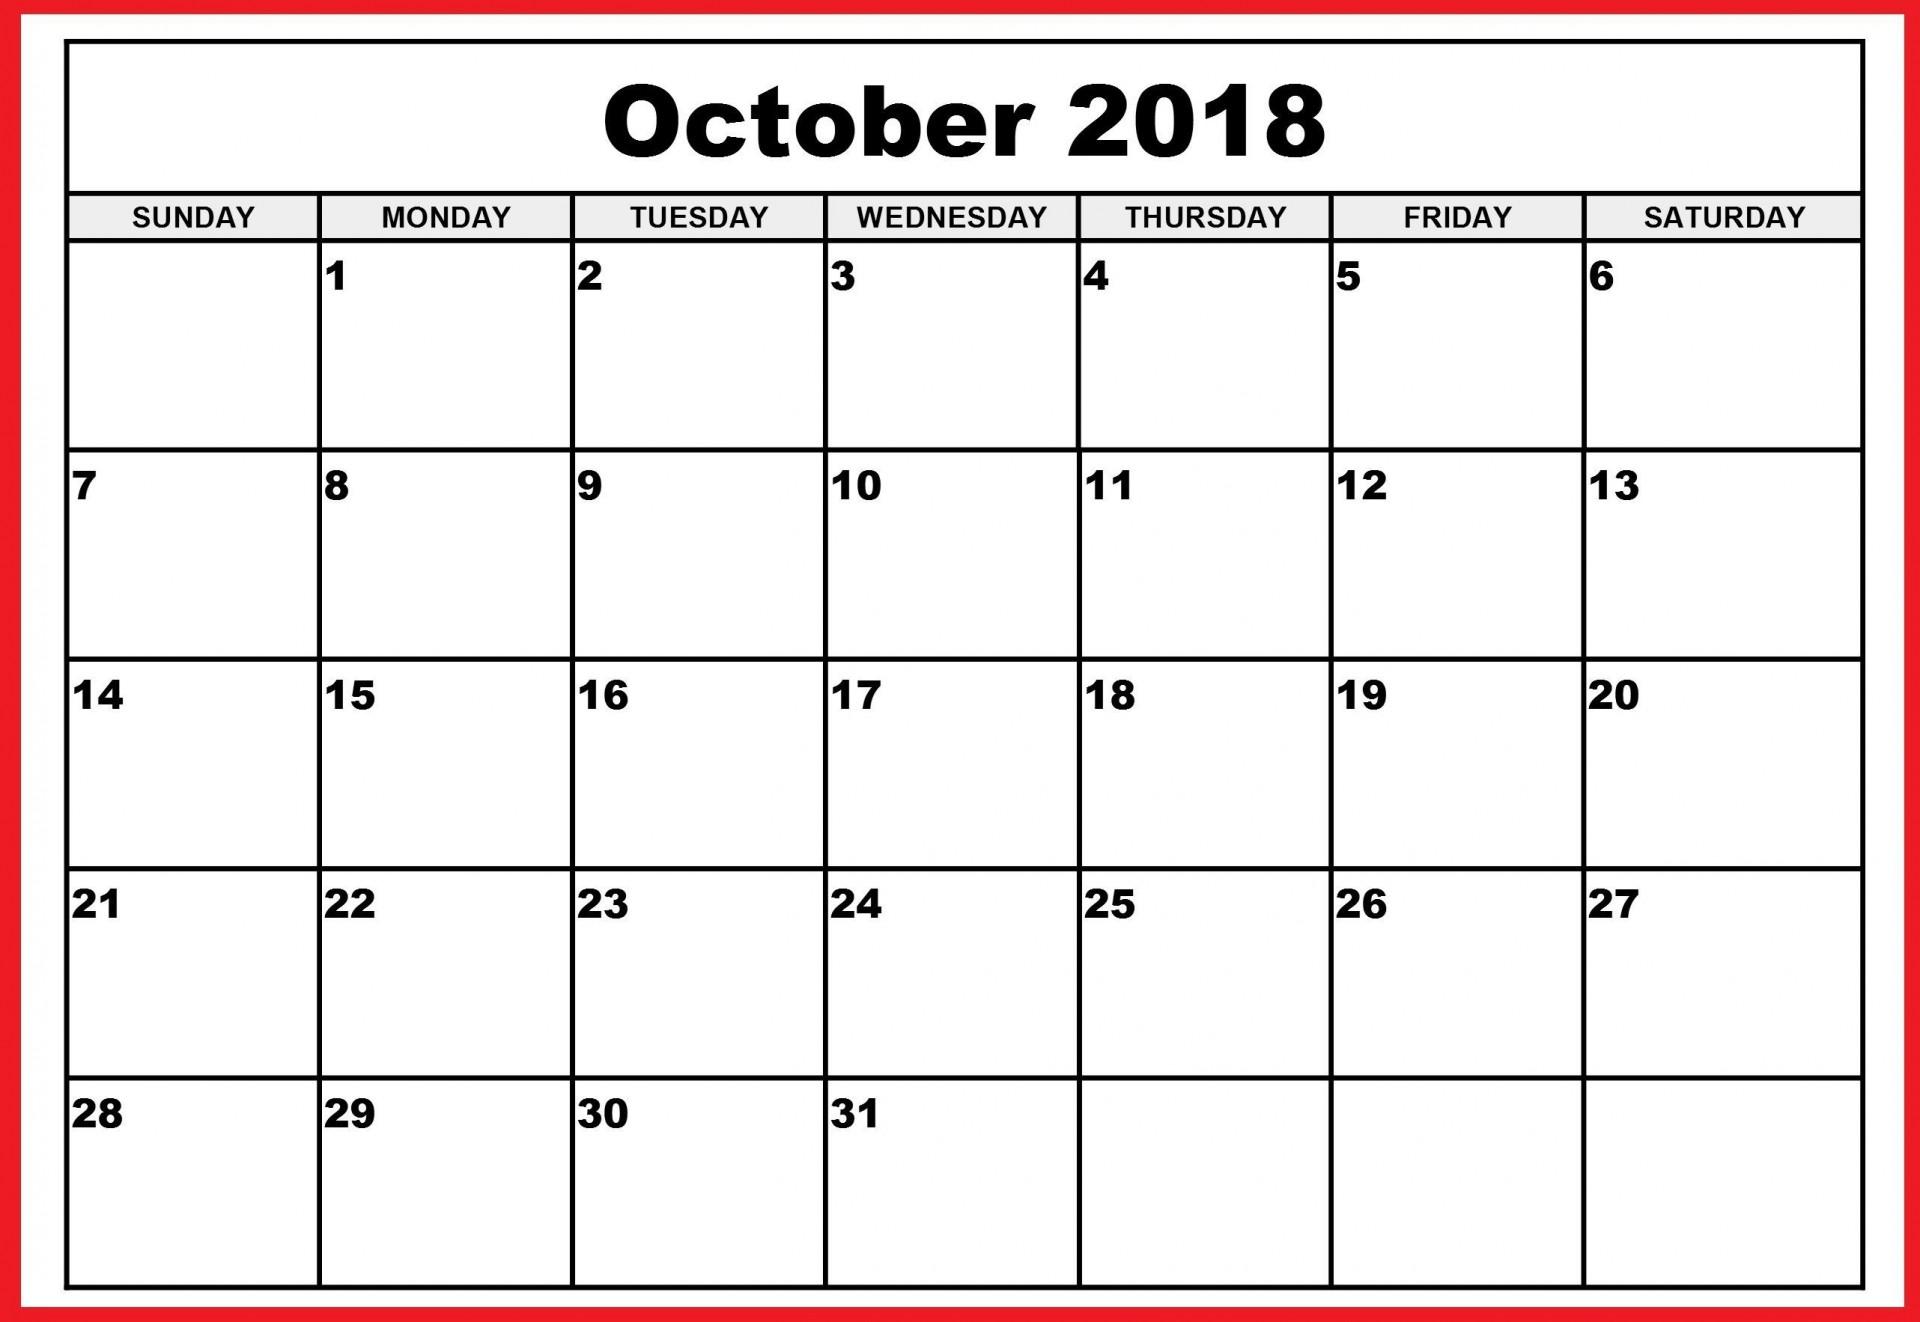 001 Top Calendar Template October 2018 Word Picture 1920